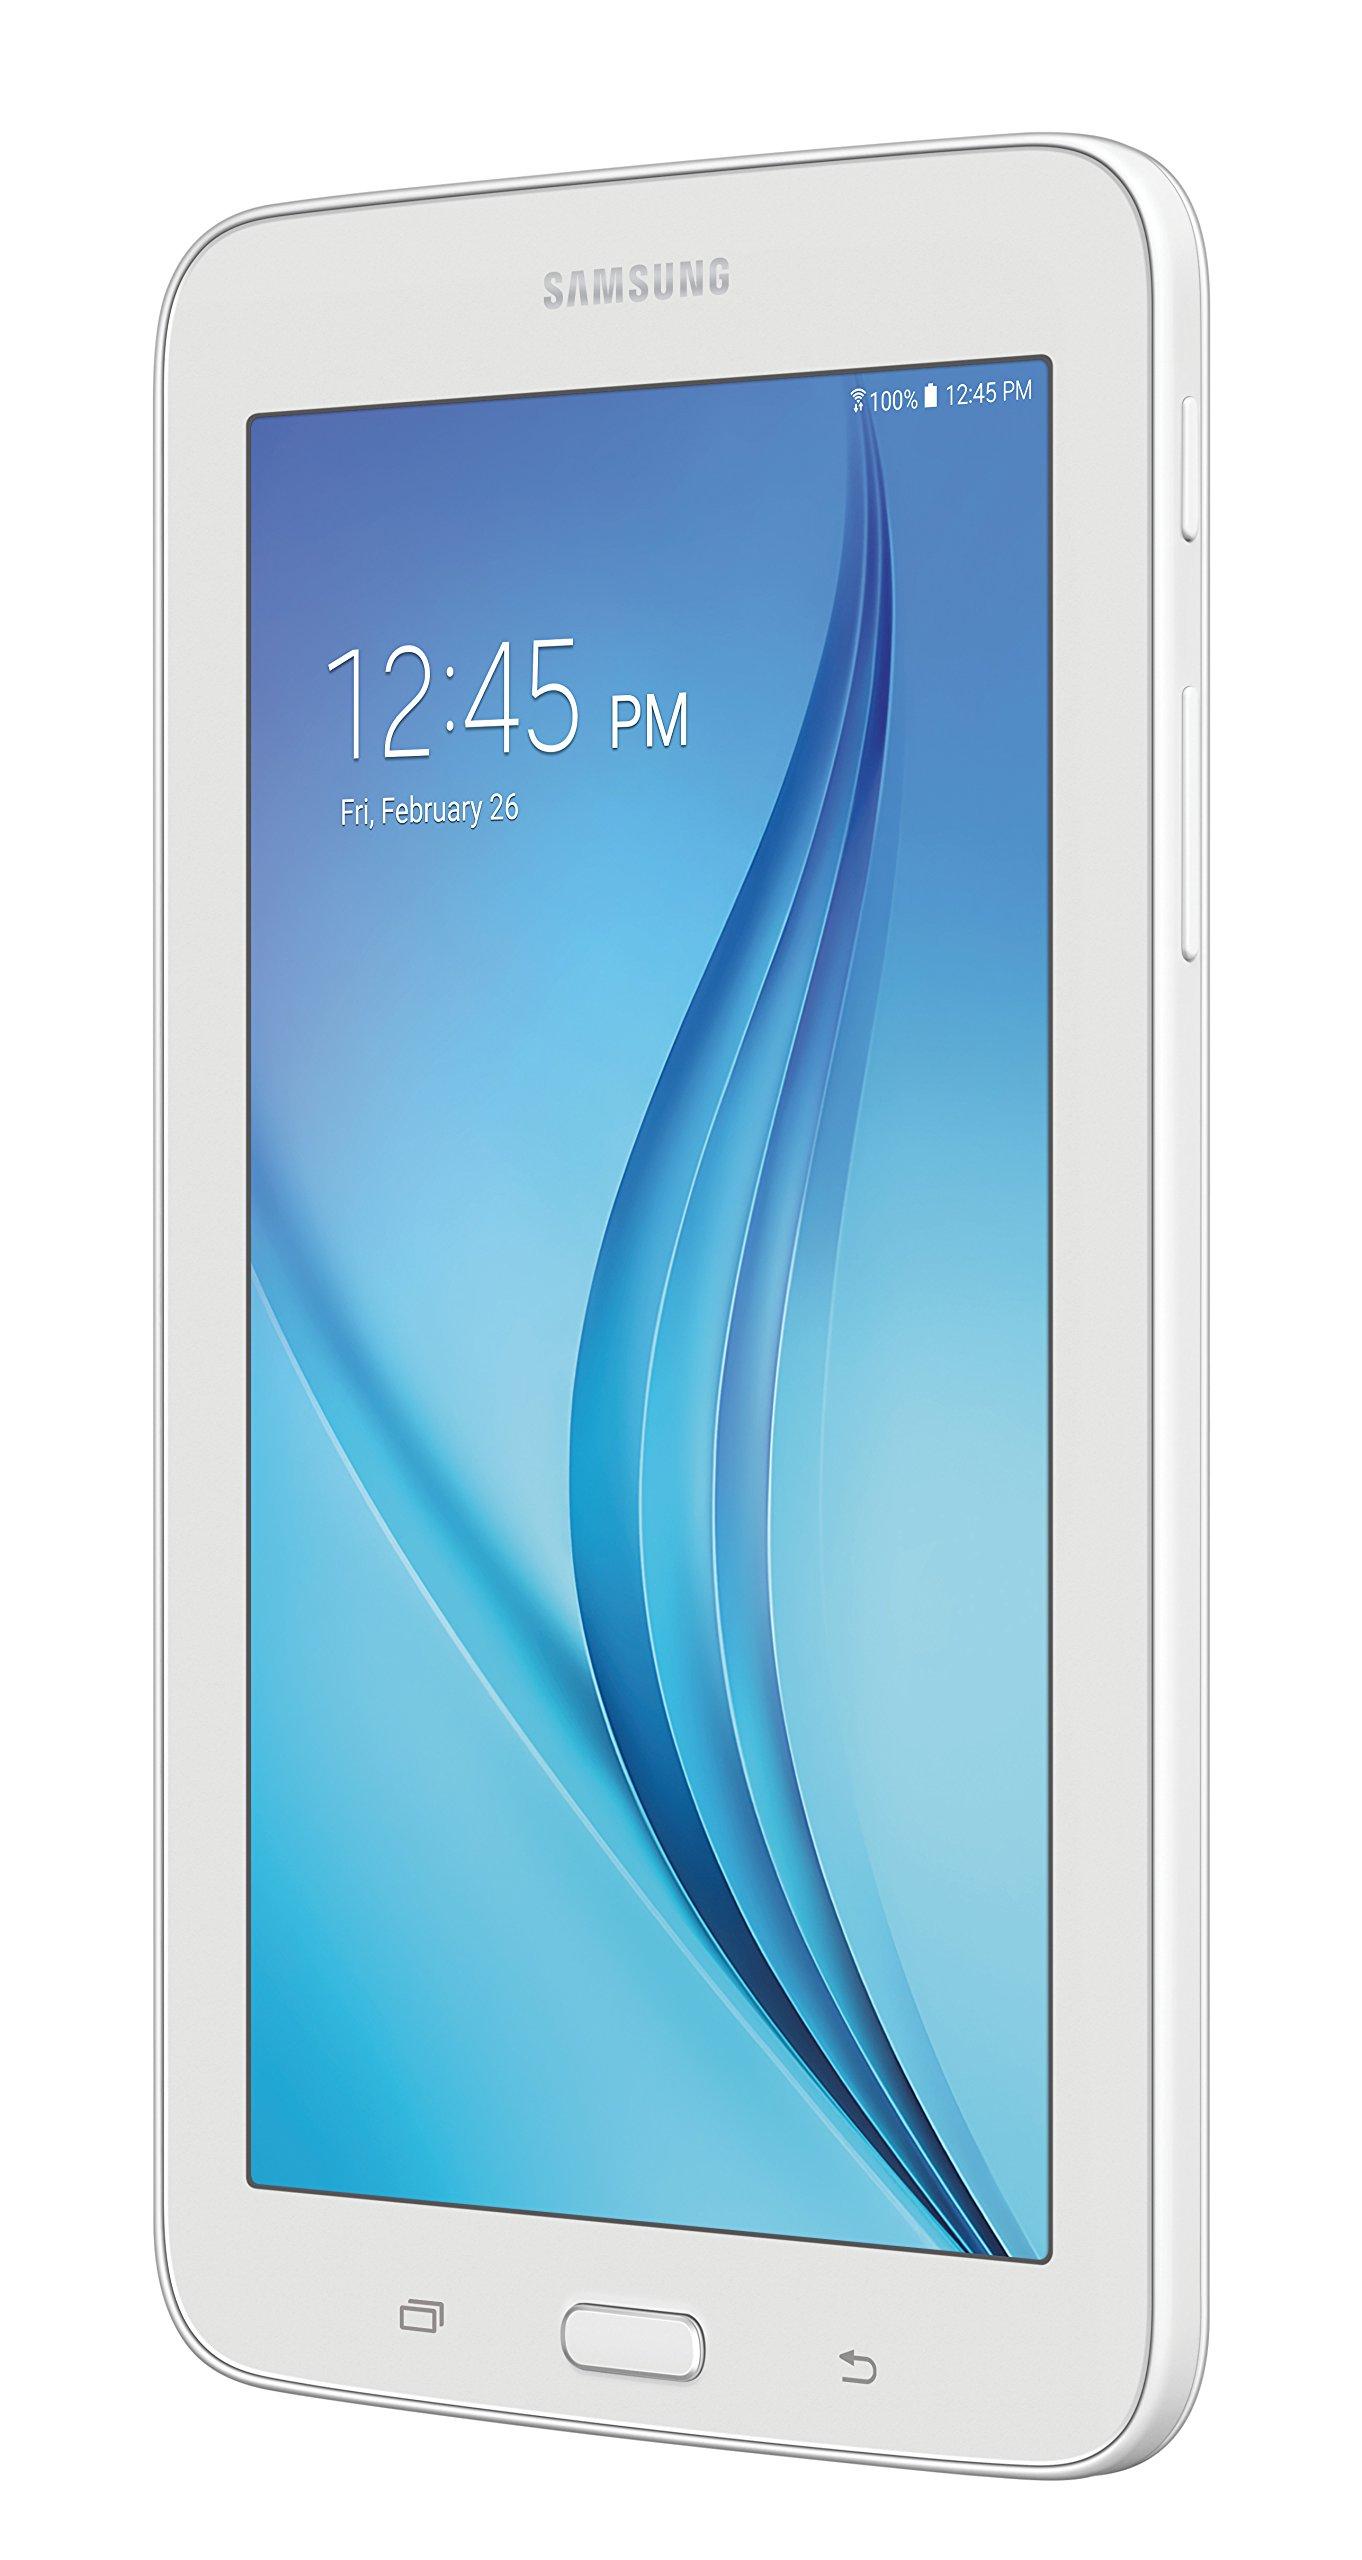 Samsung Galaxy Tab E Lite 7''; 8 GB Wifi Tablet (White) SM-T113NDWAXAR by Samsung (Image #3)